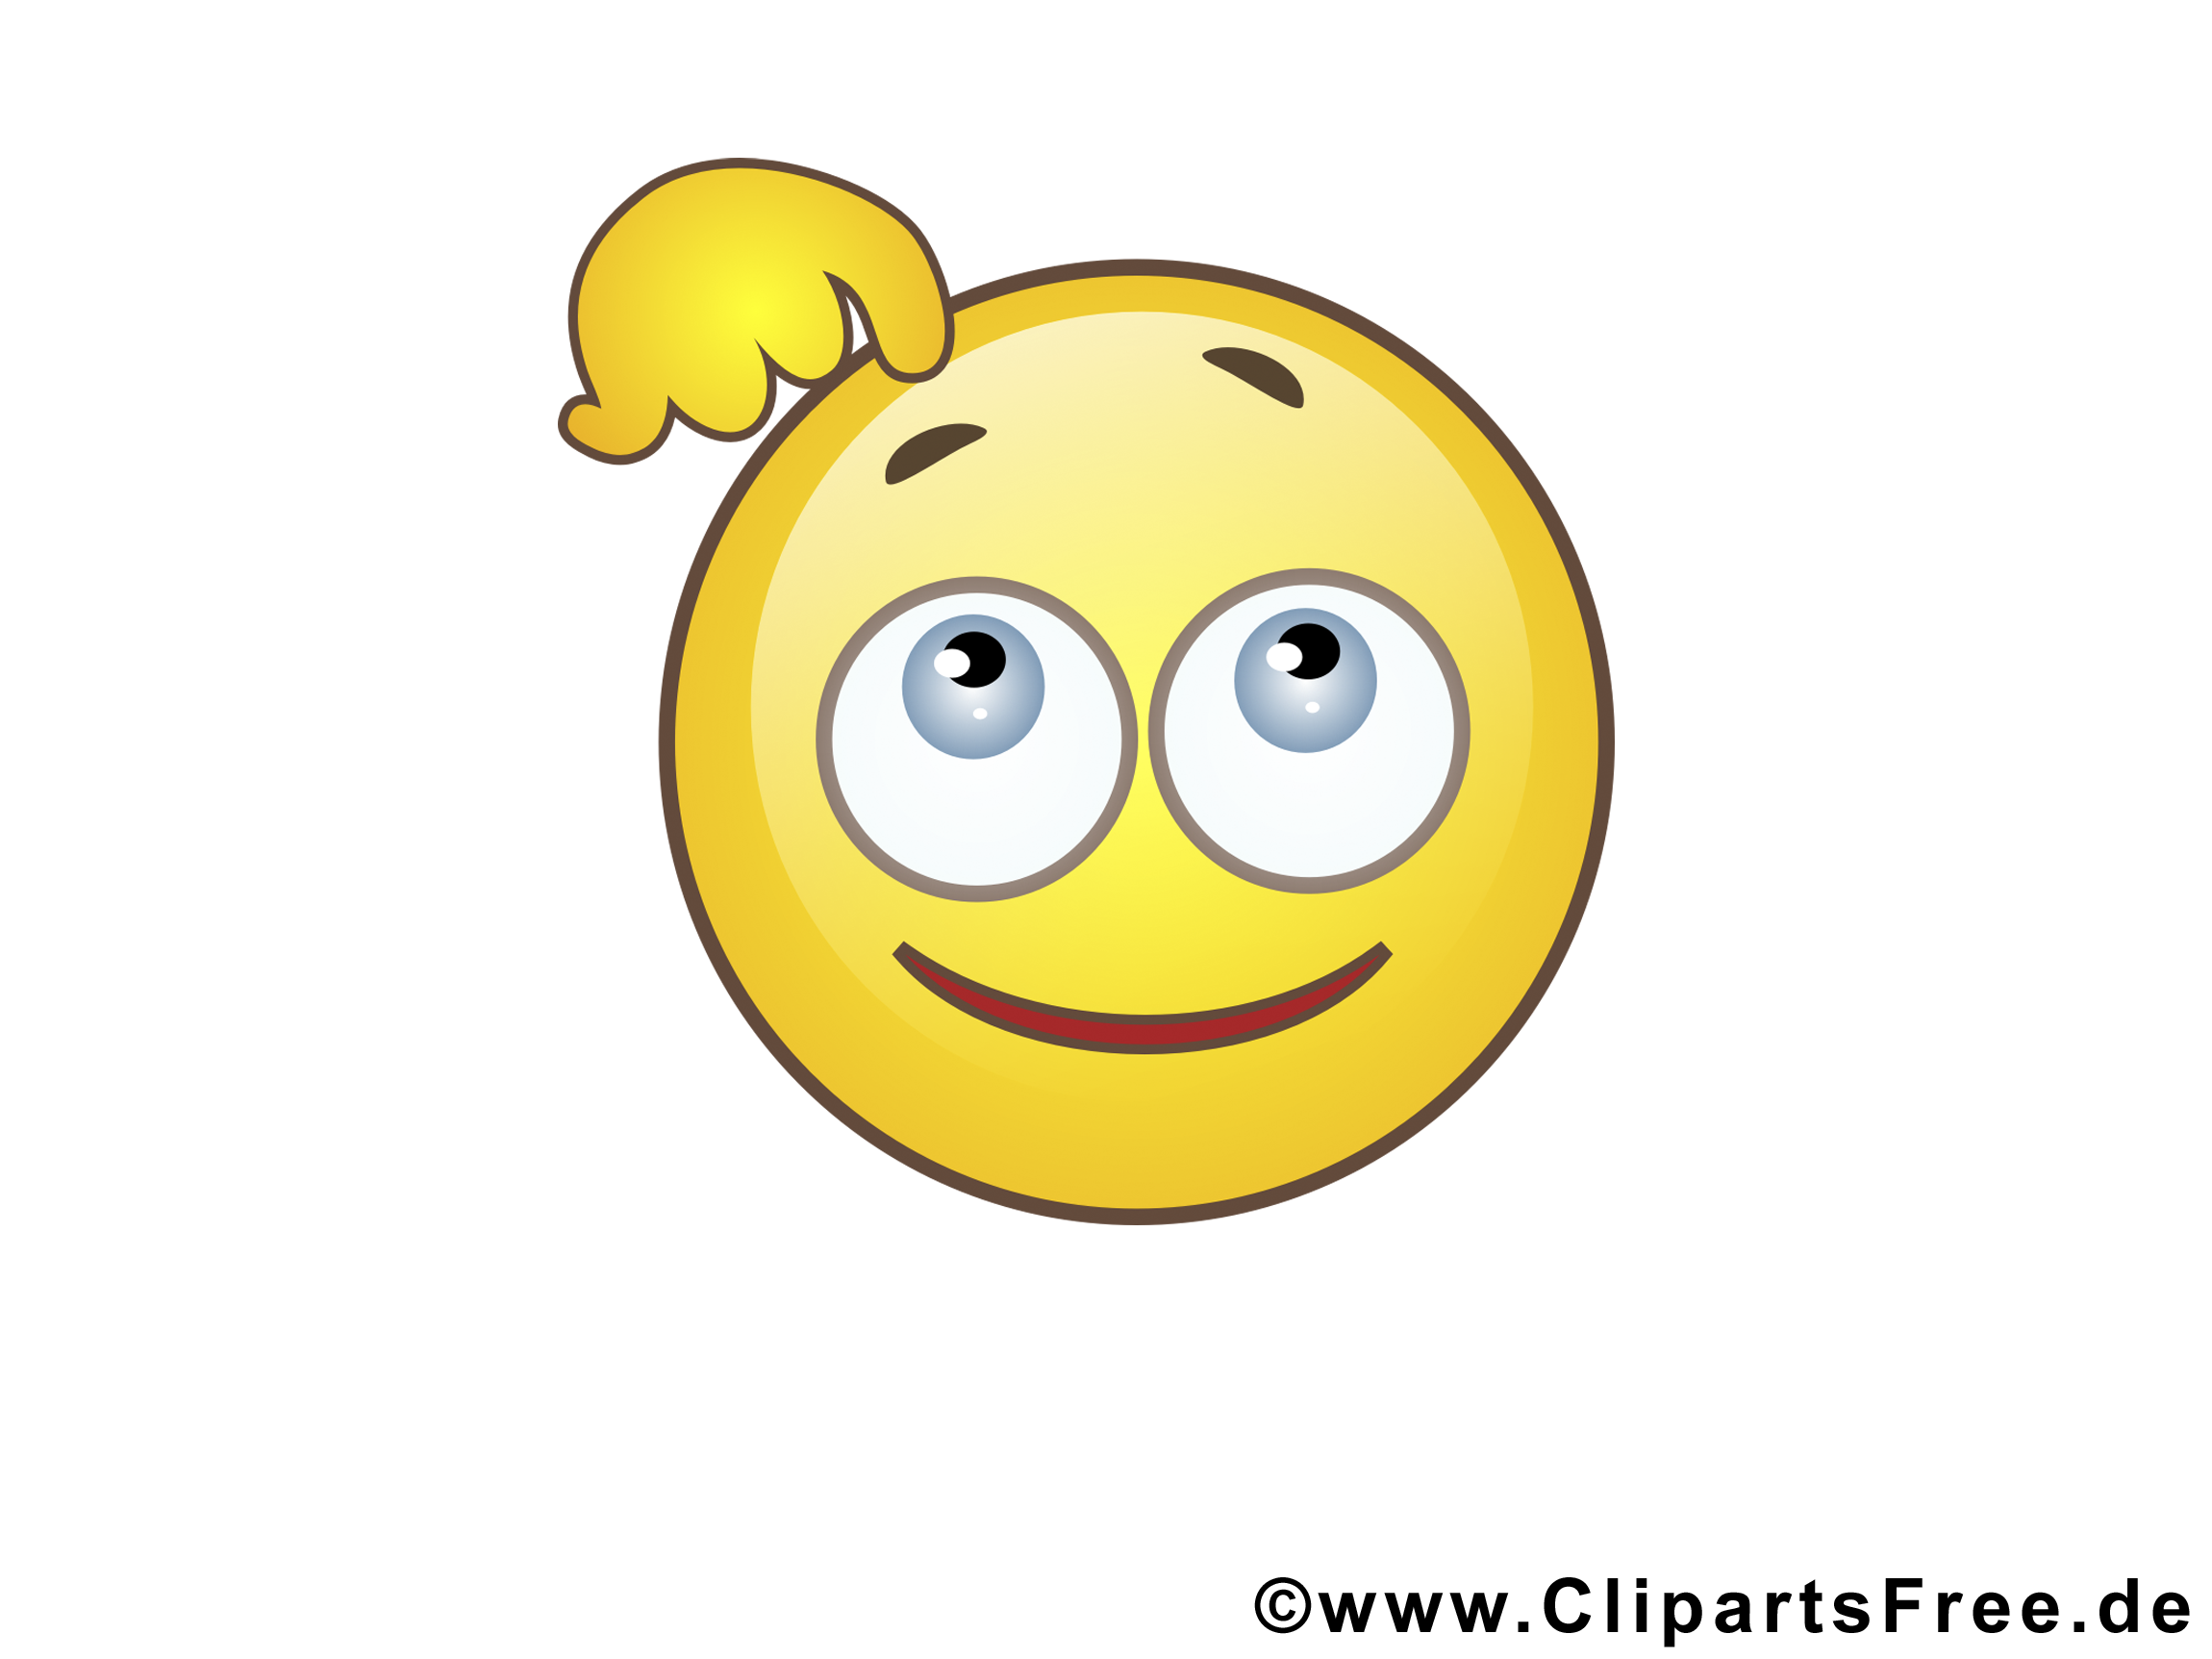 Pensif smiley illustration smileys dessin picture - Image smiley gratuit ...